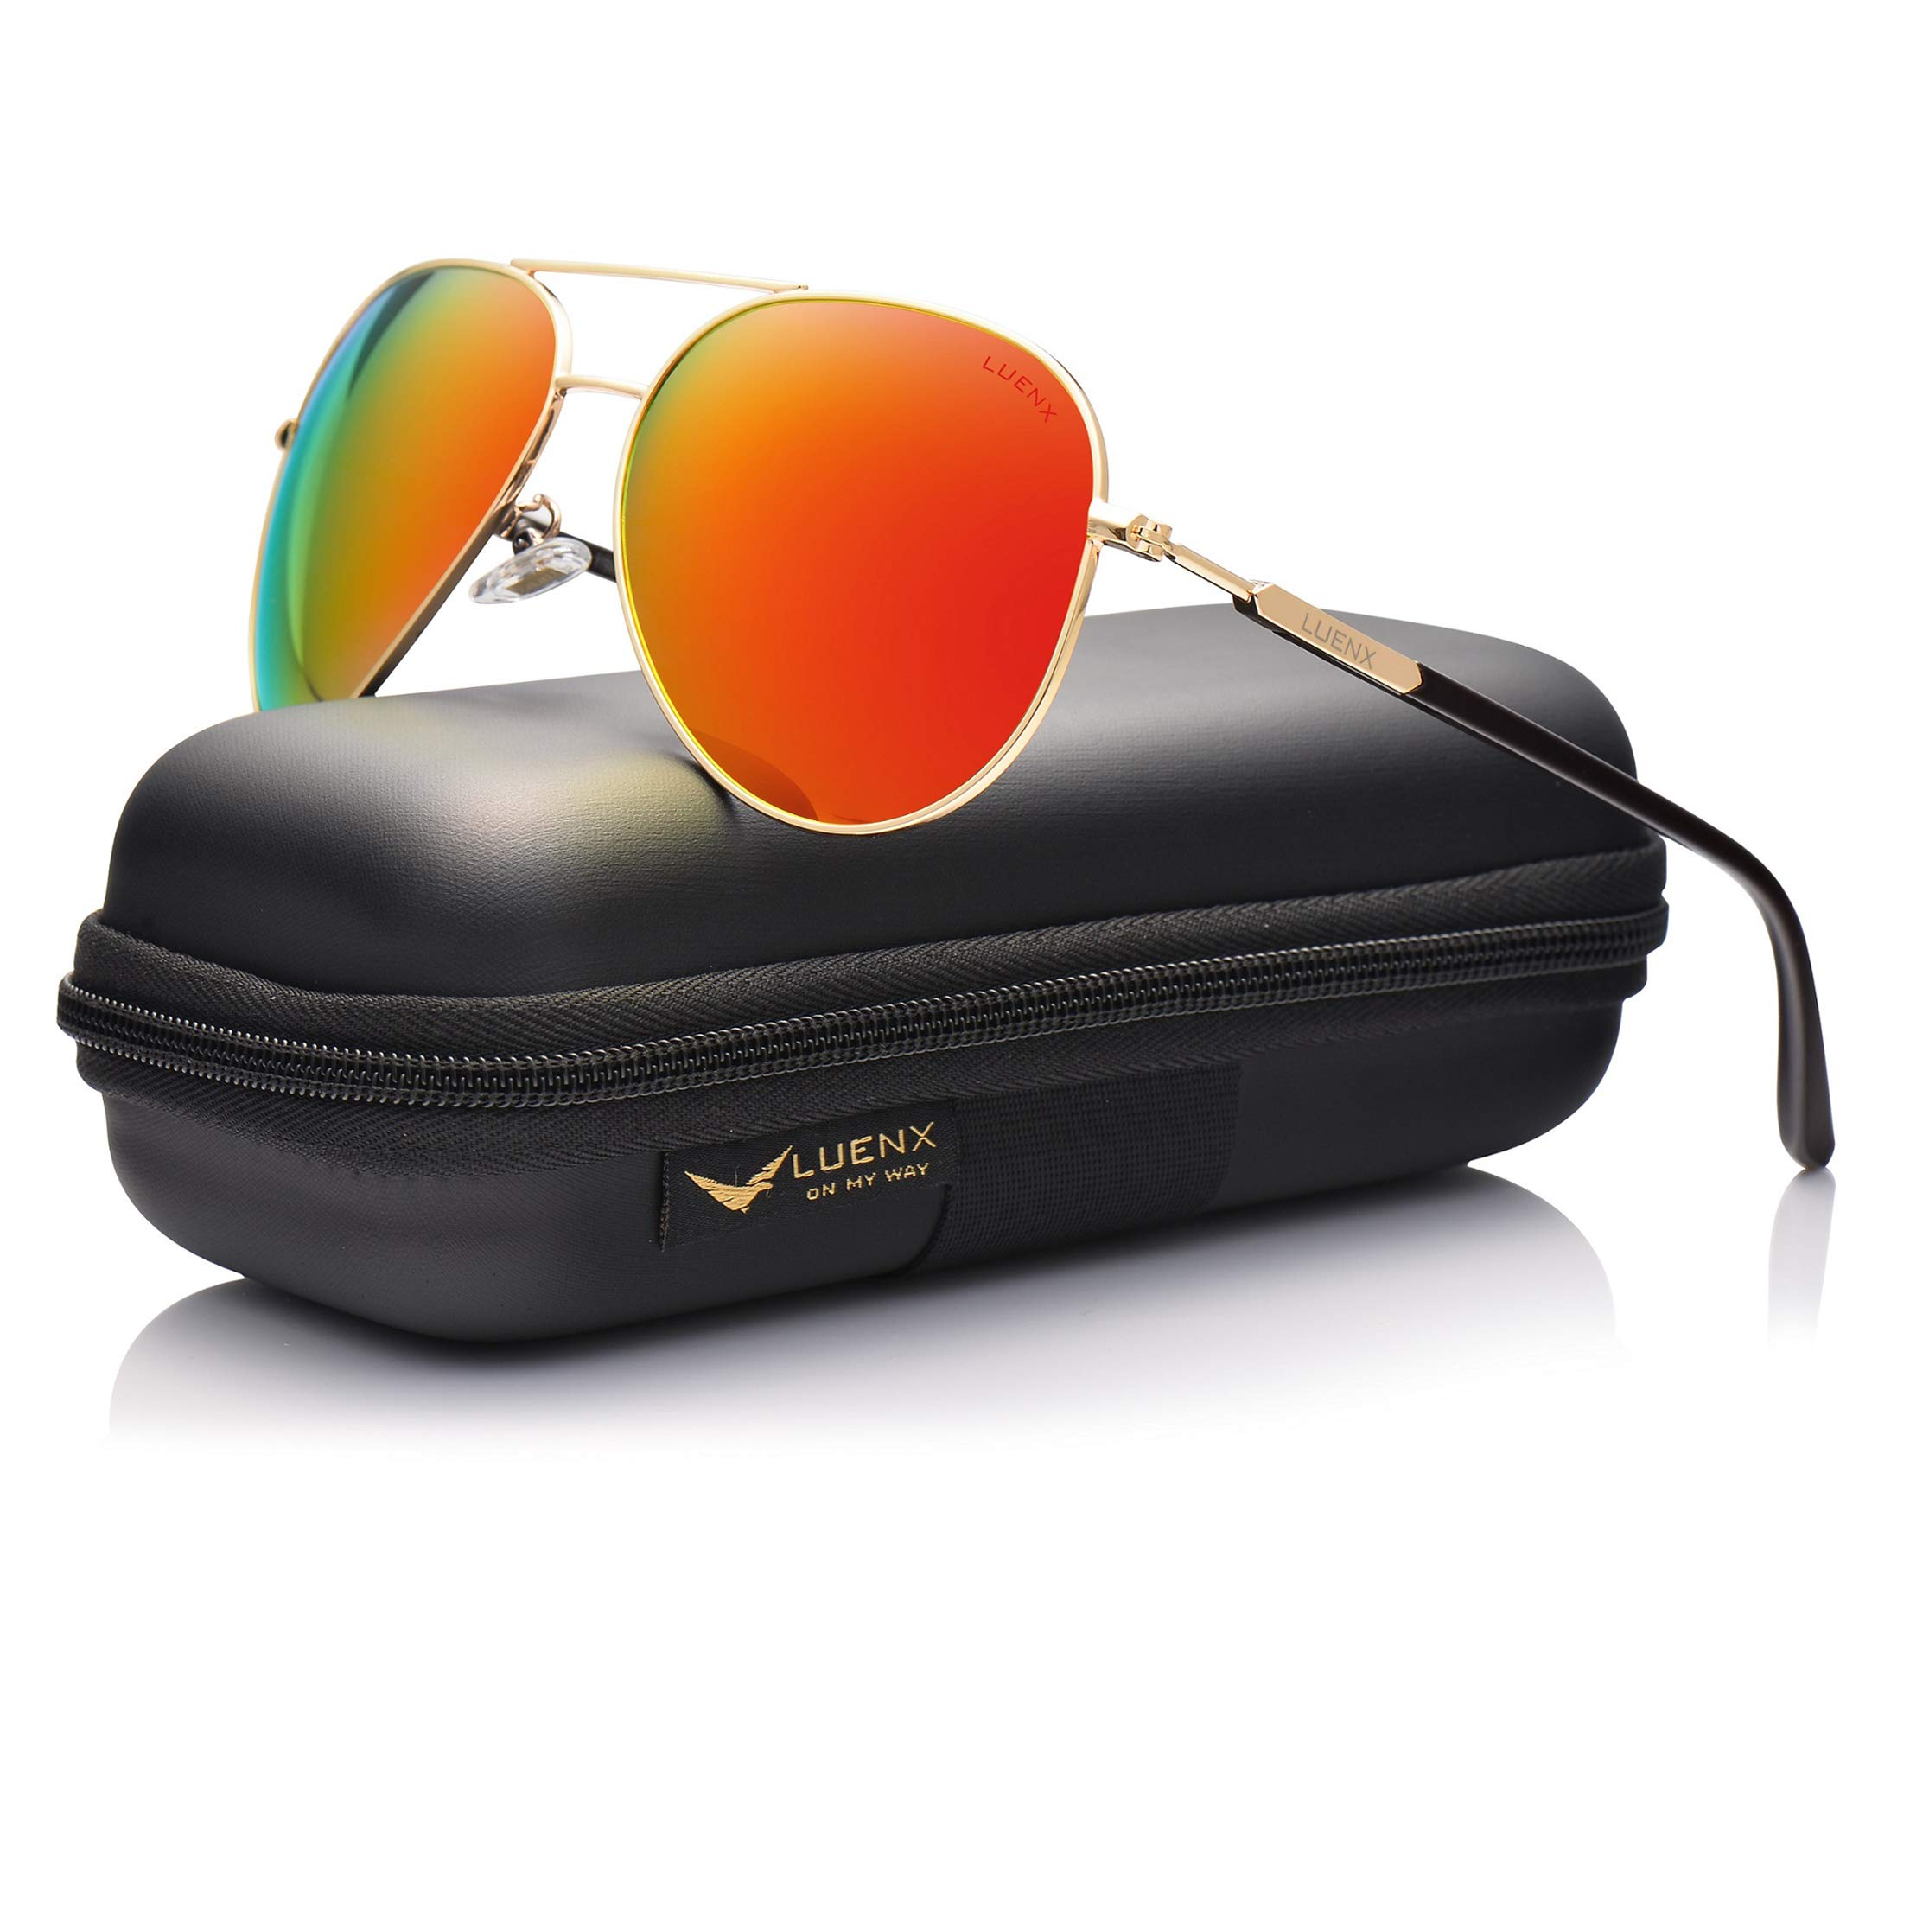 LUENX Womens Mens Aviator Sunglasses Polarized with Case - UV 400 Protection Orange Lens Gold Frame 60mm